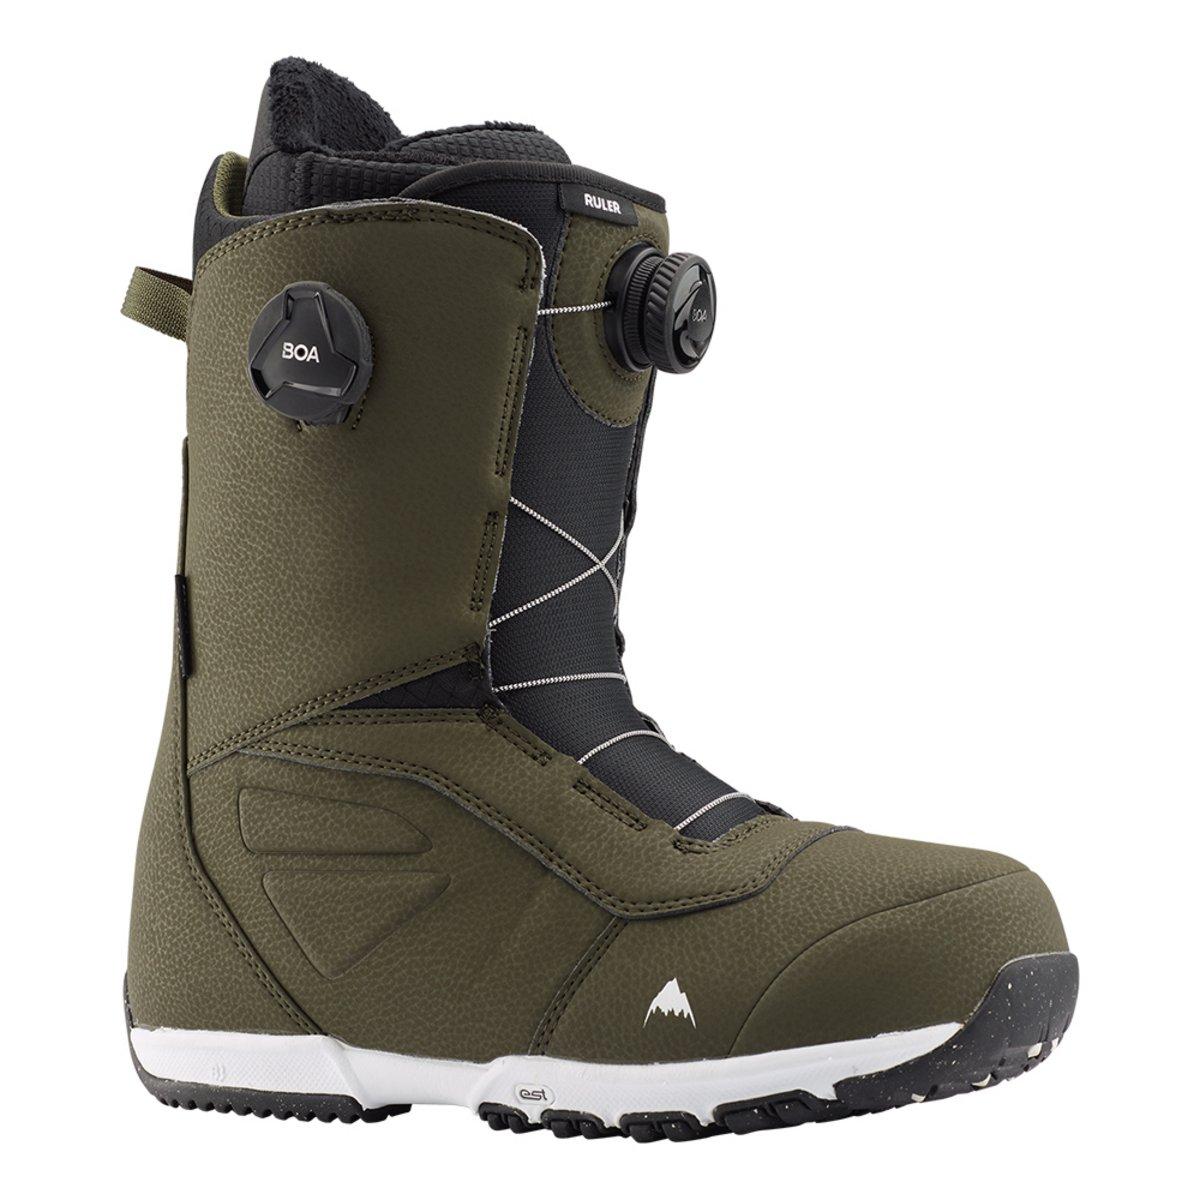 Burton Men's Ruler Double Boa Snowboard Boots 2019 / 2020 0